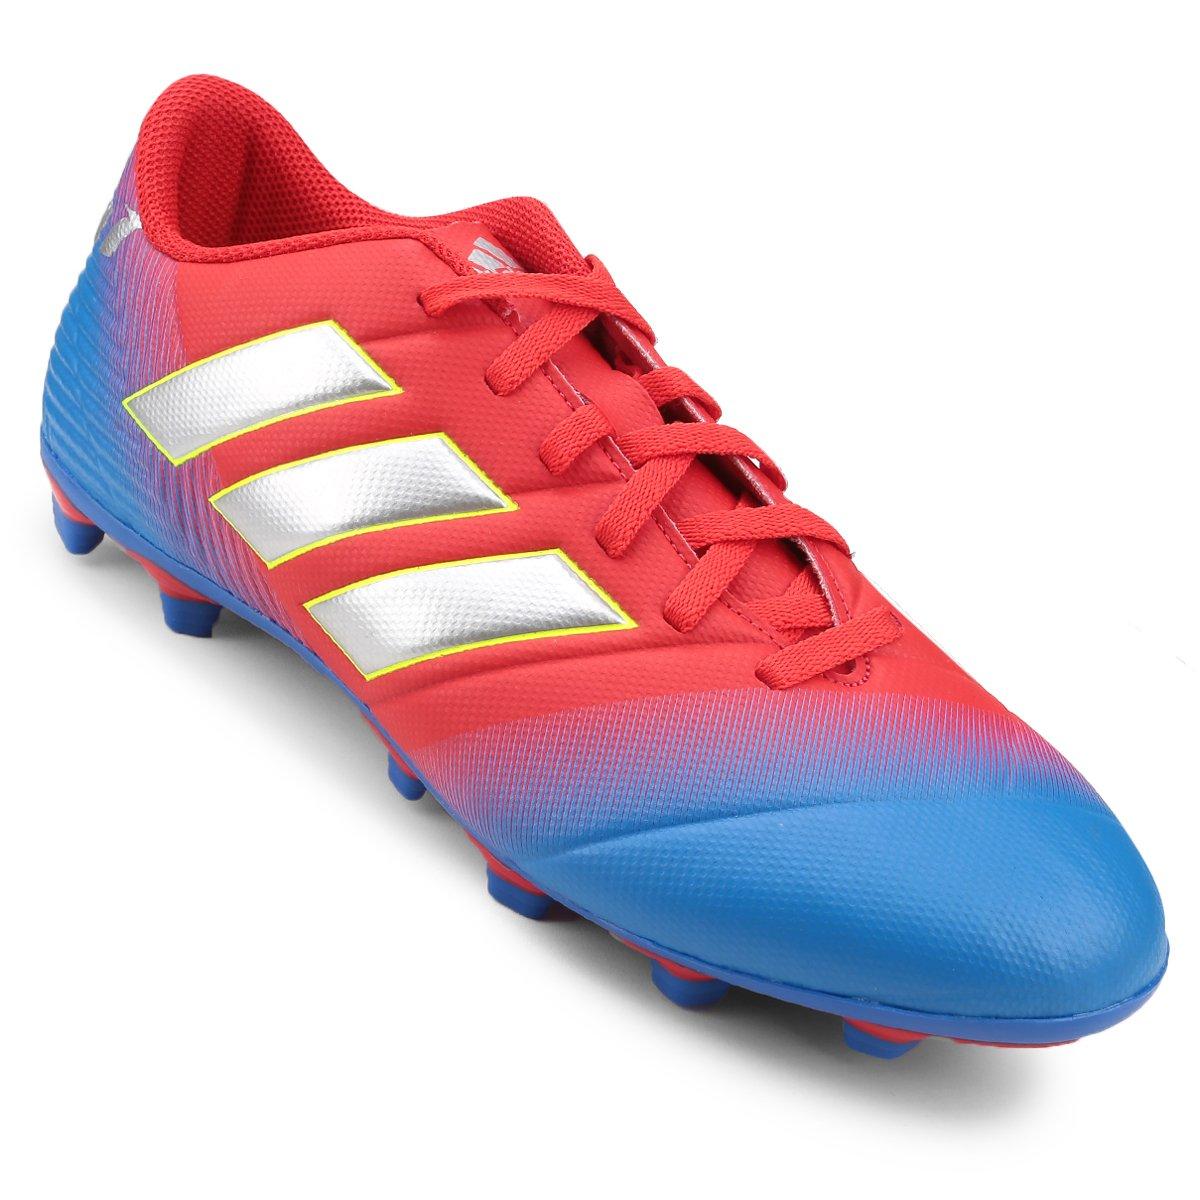 c294360c99 Chuteira Campo Adidas Nemeziz Messi 18 4 FG